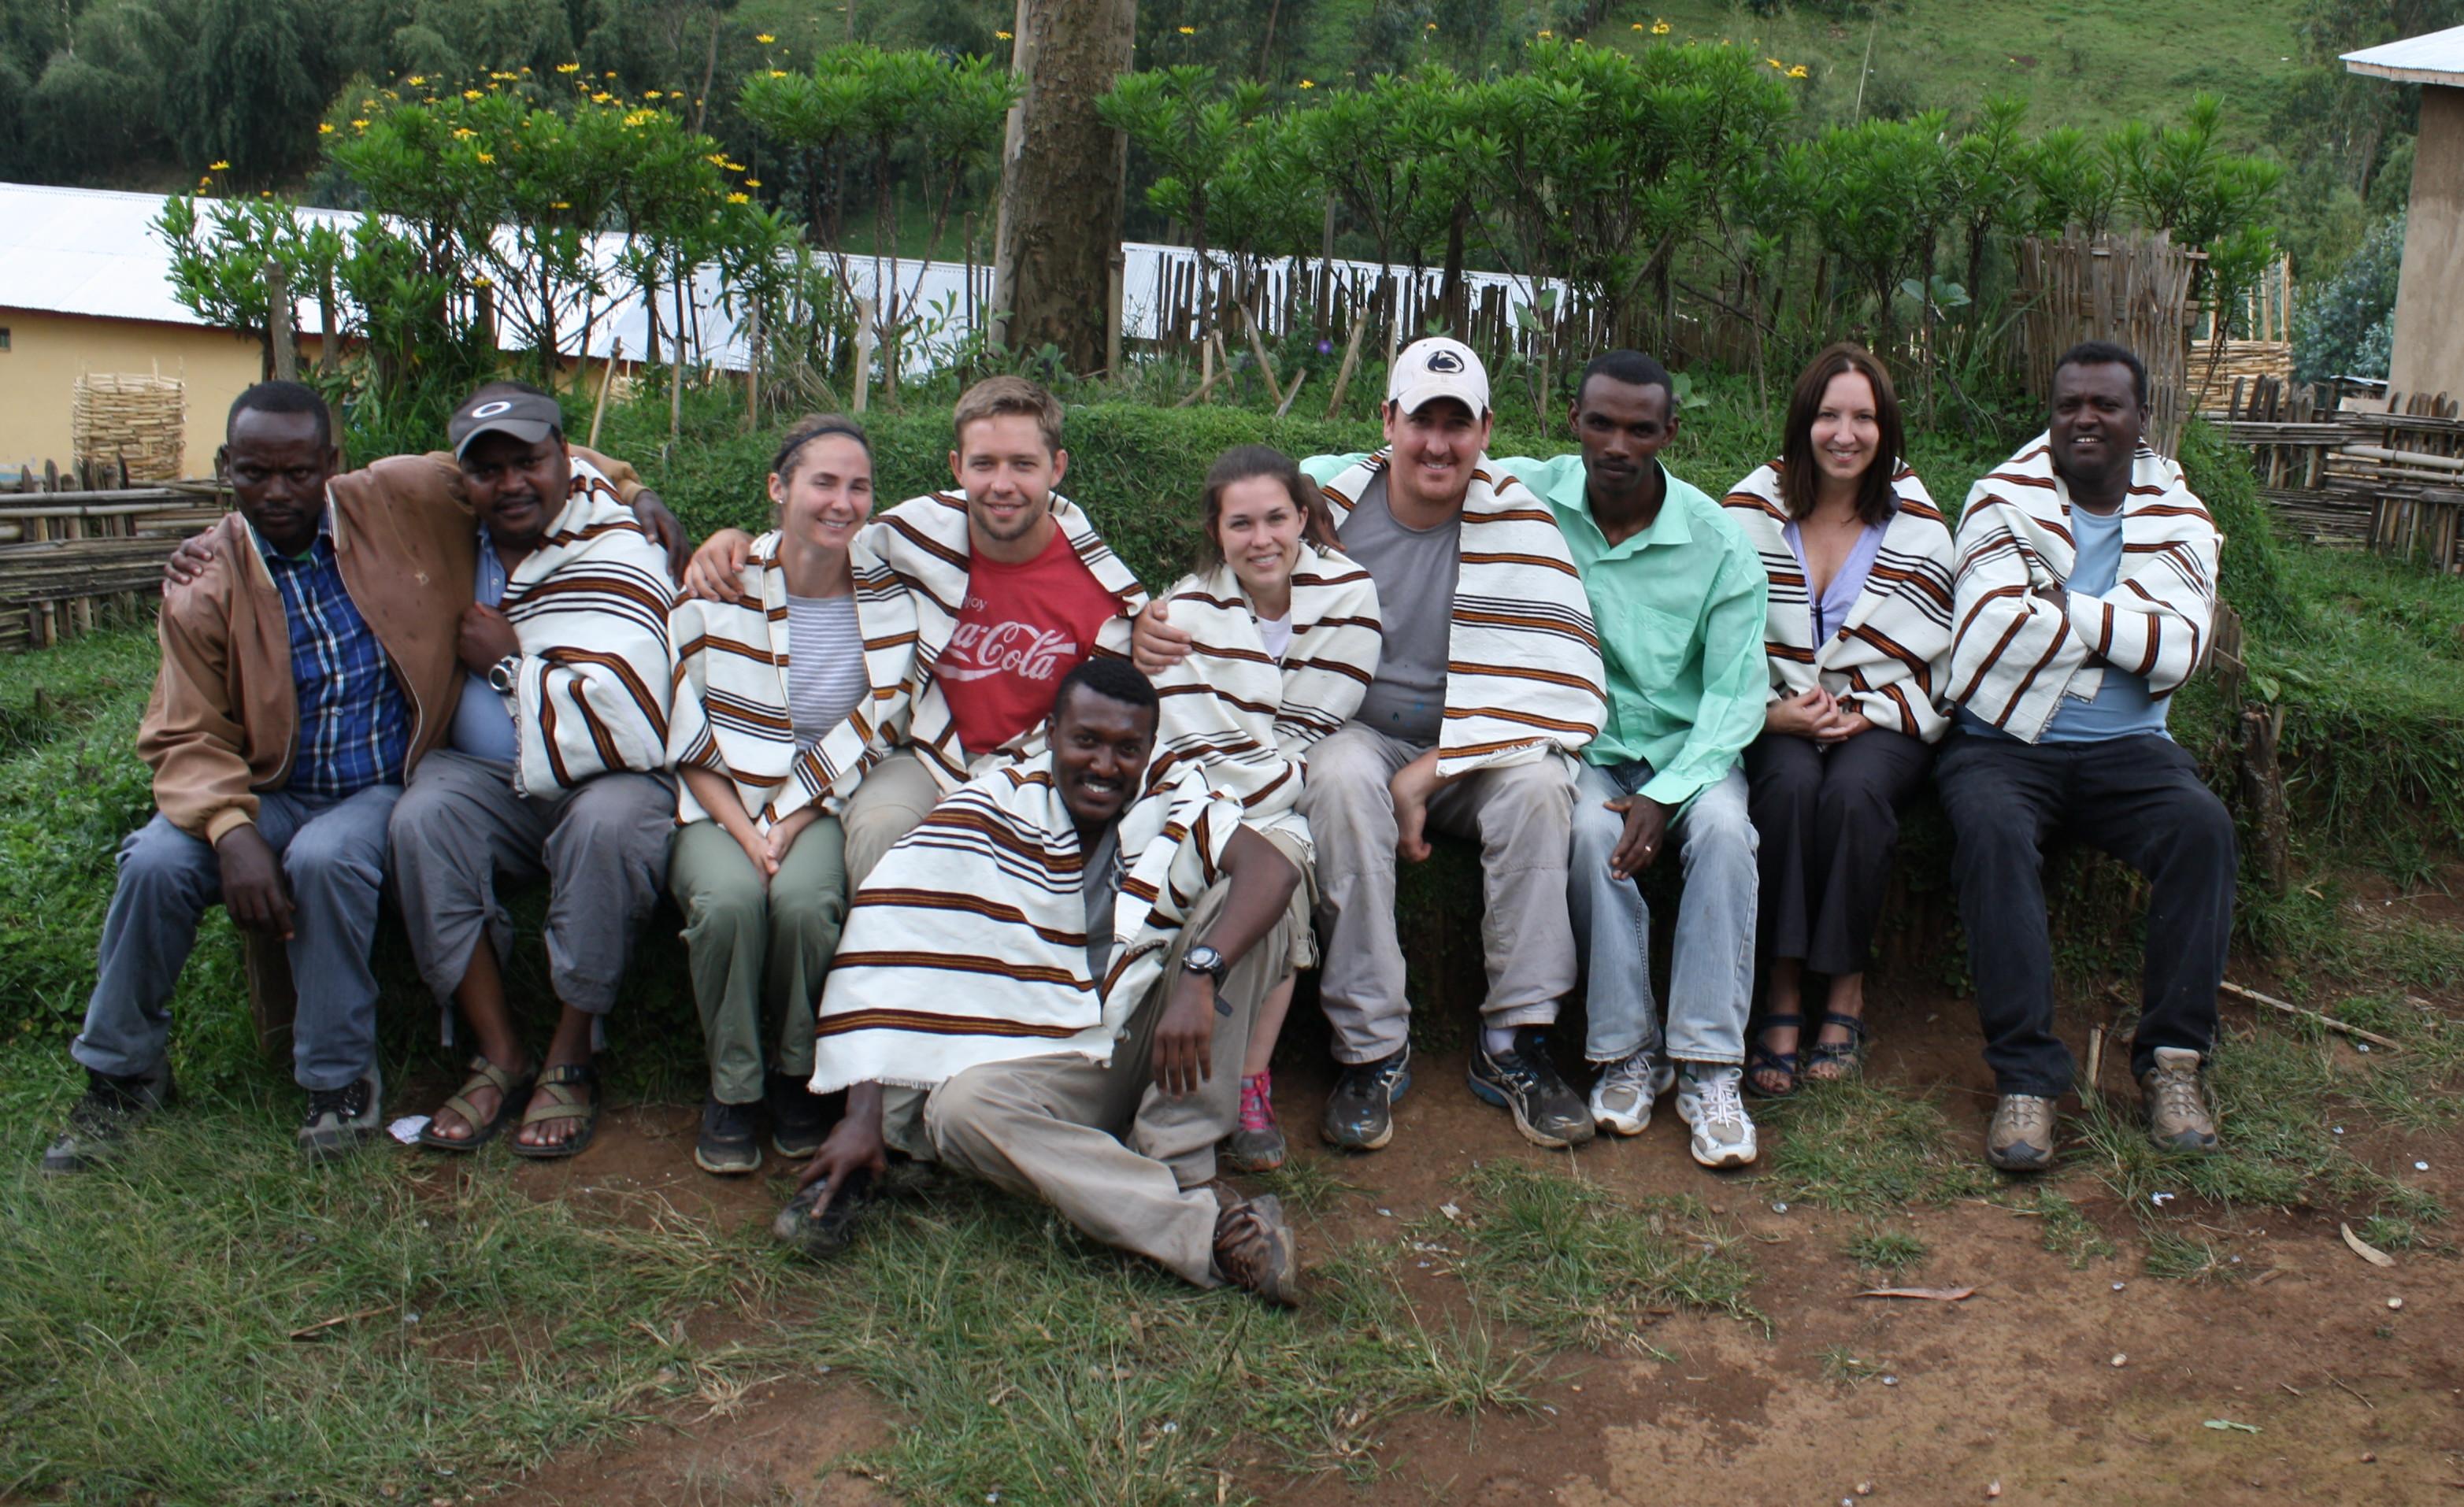 Day 9 – Preparing to leave Ethiopia